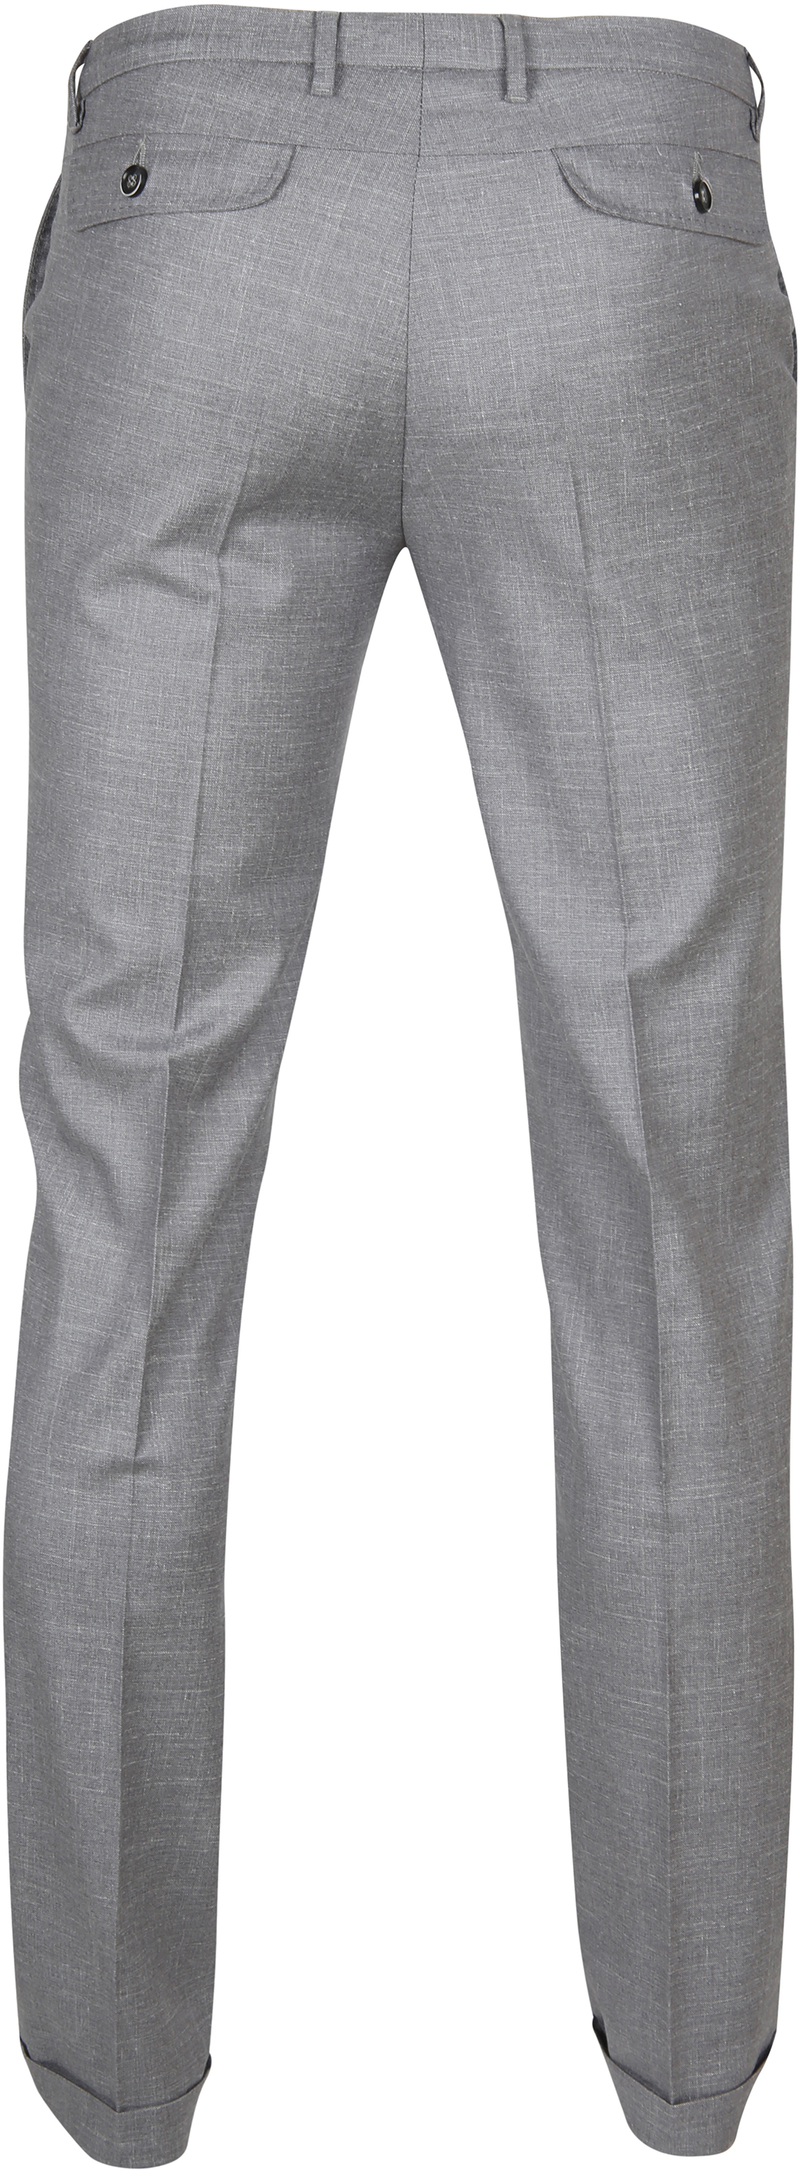 Suitable Pantalon Pisa Melange Grey photo 5